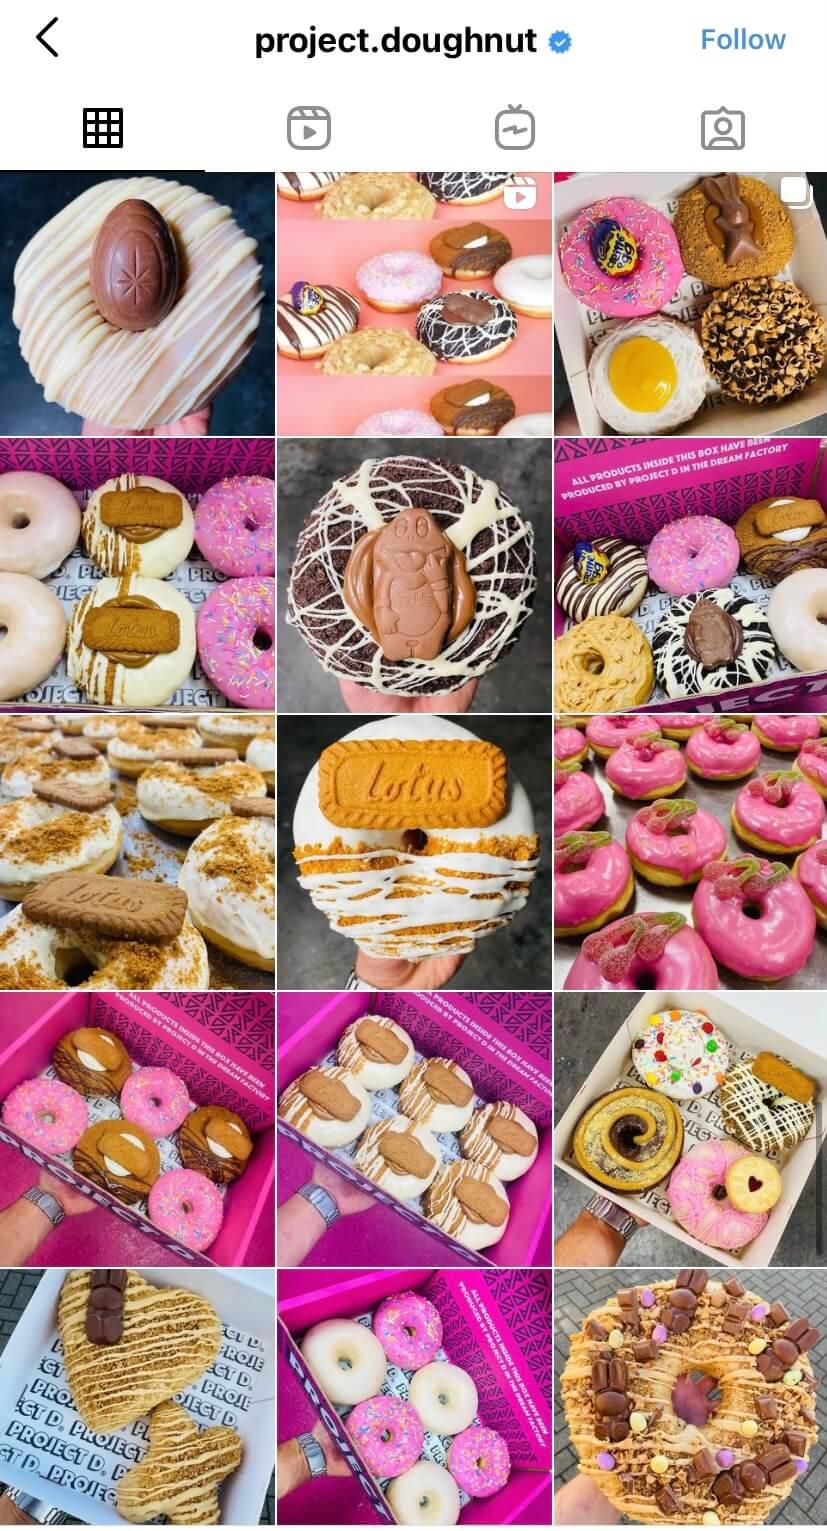 social media profile of project doughnut